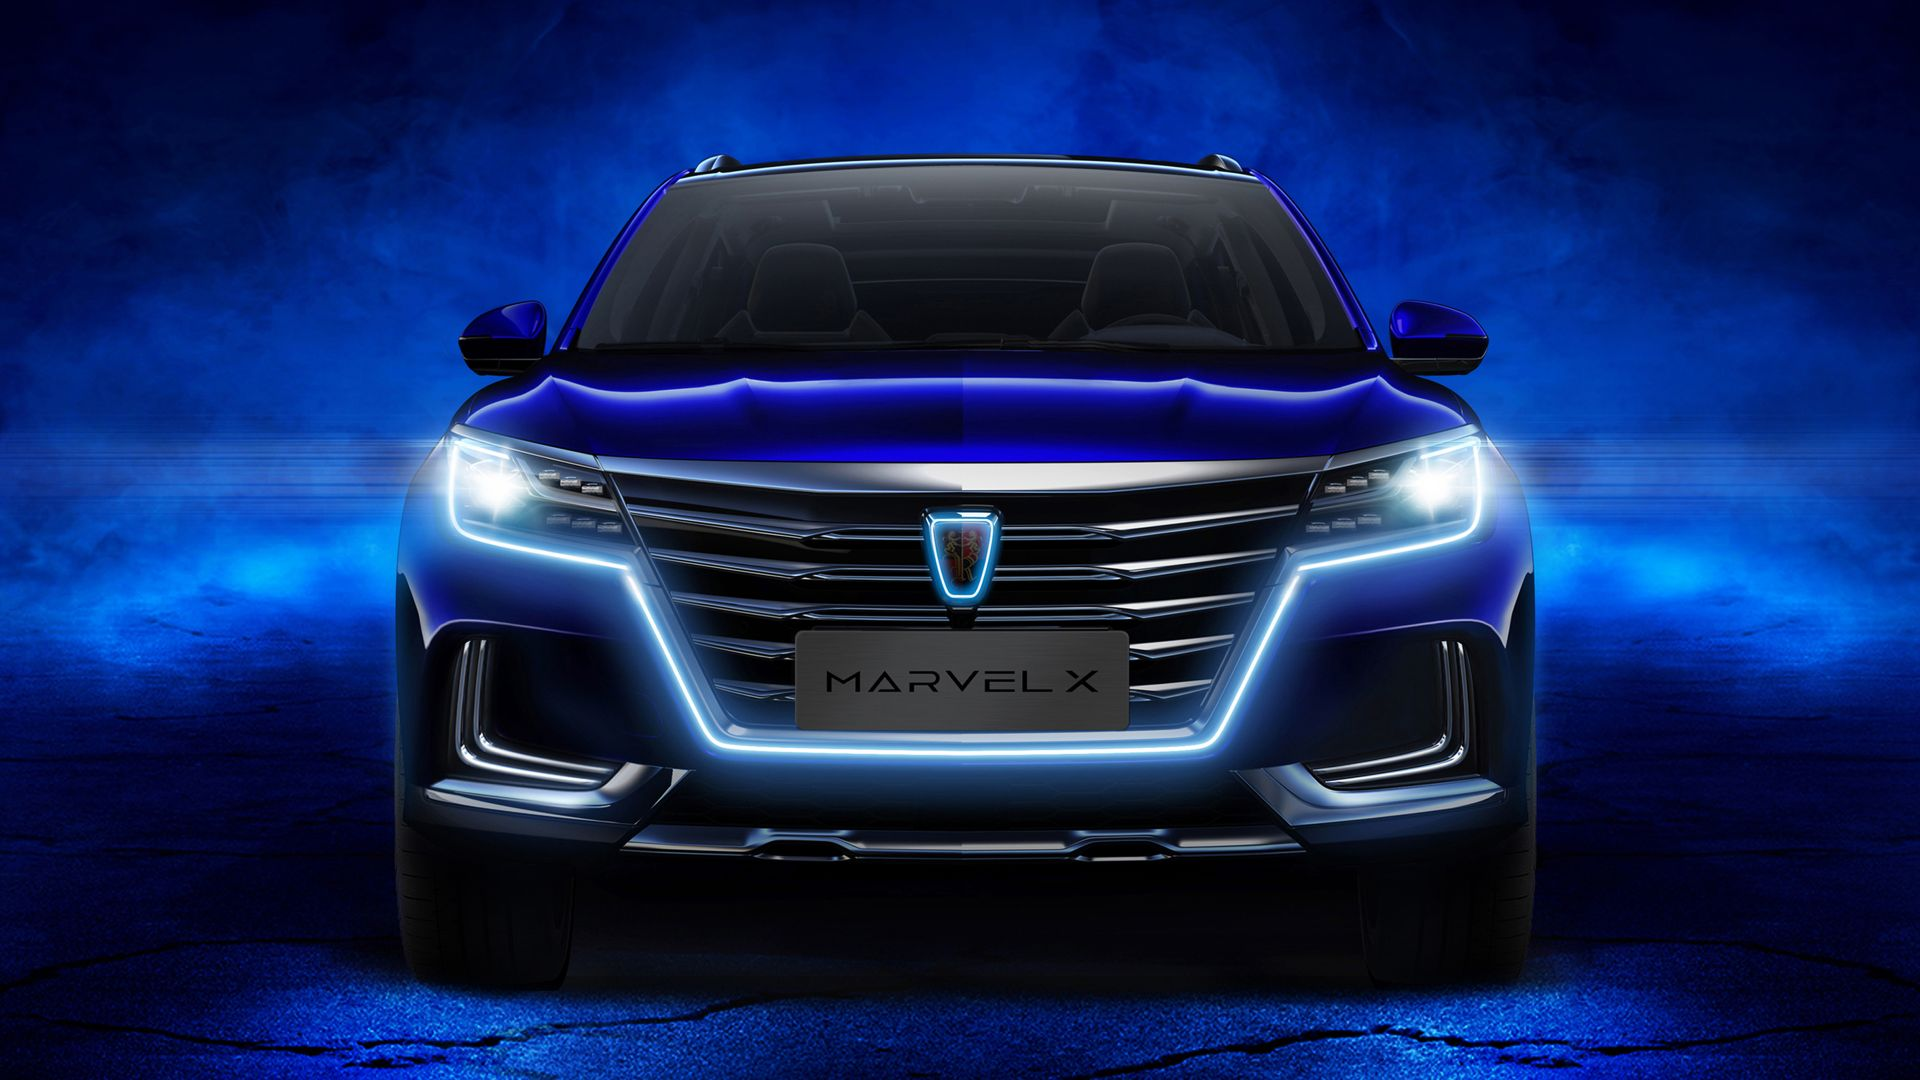 Wallpaper Roewe Marvel X, Crossover, 2018 Cars, Dark Blue